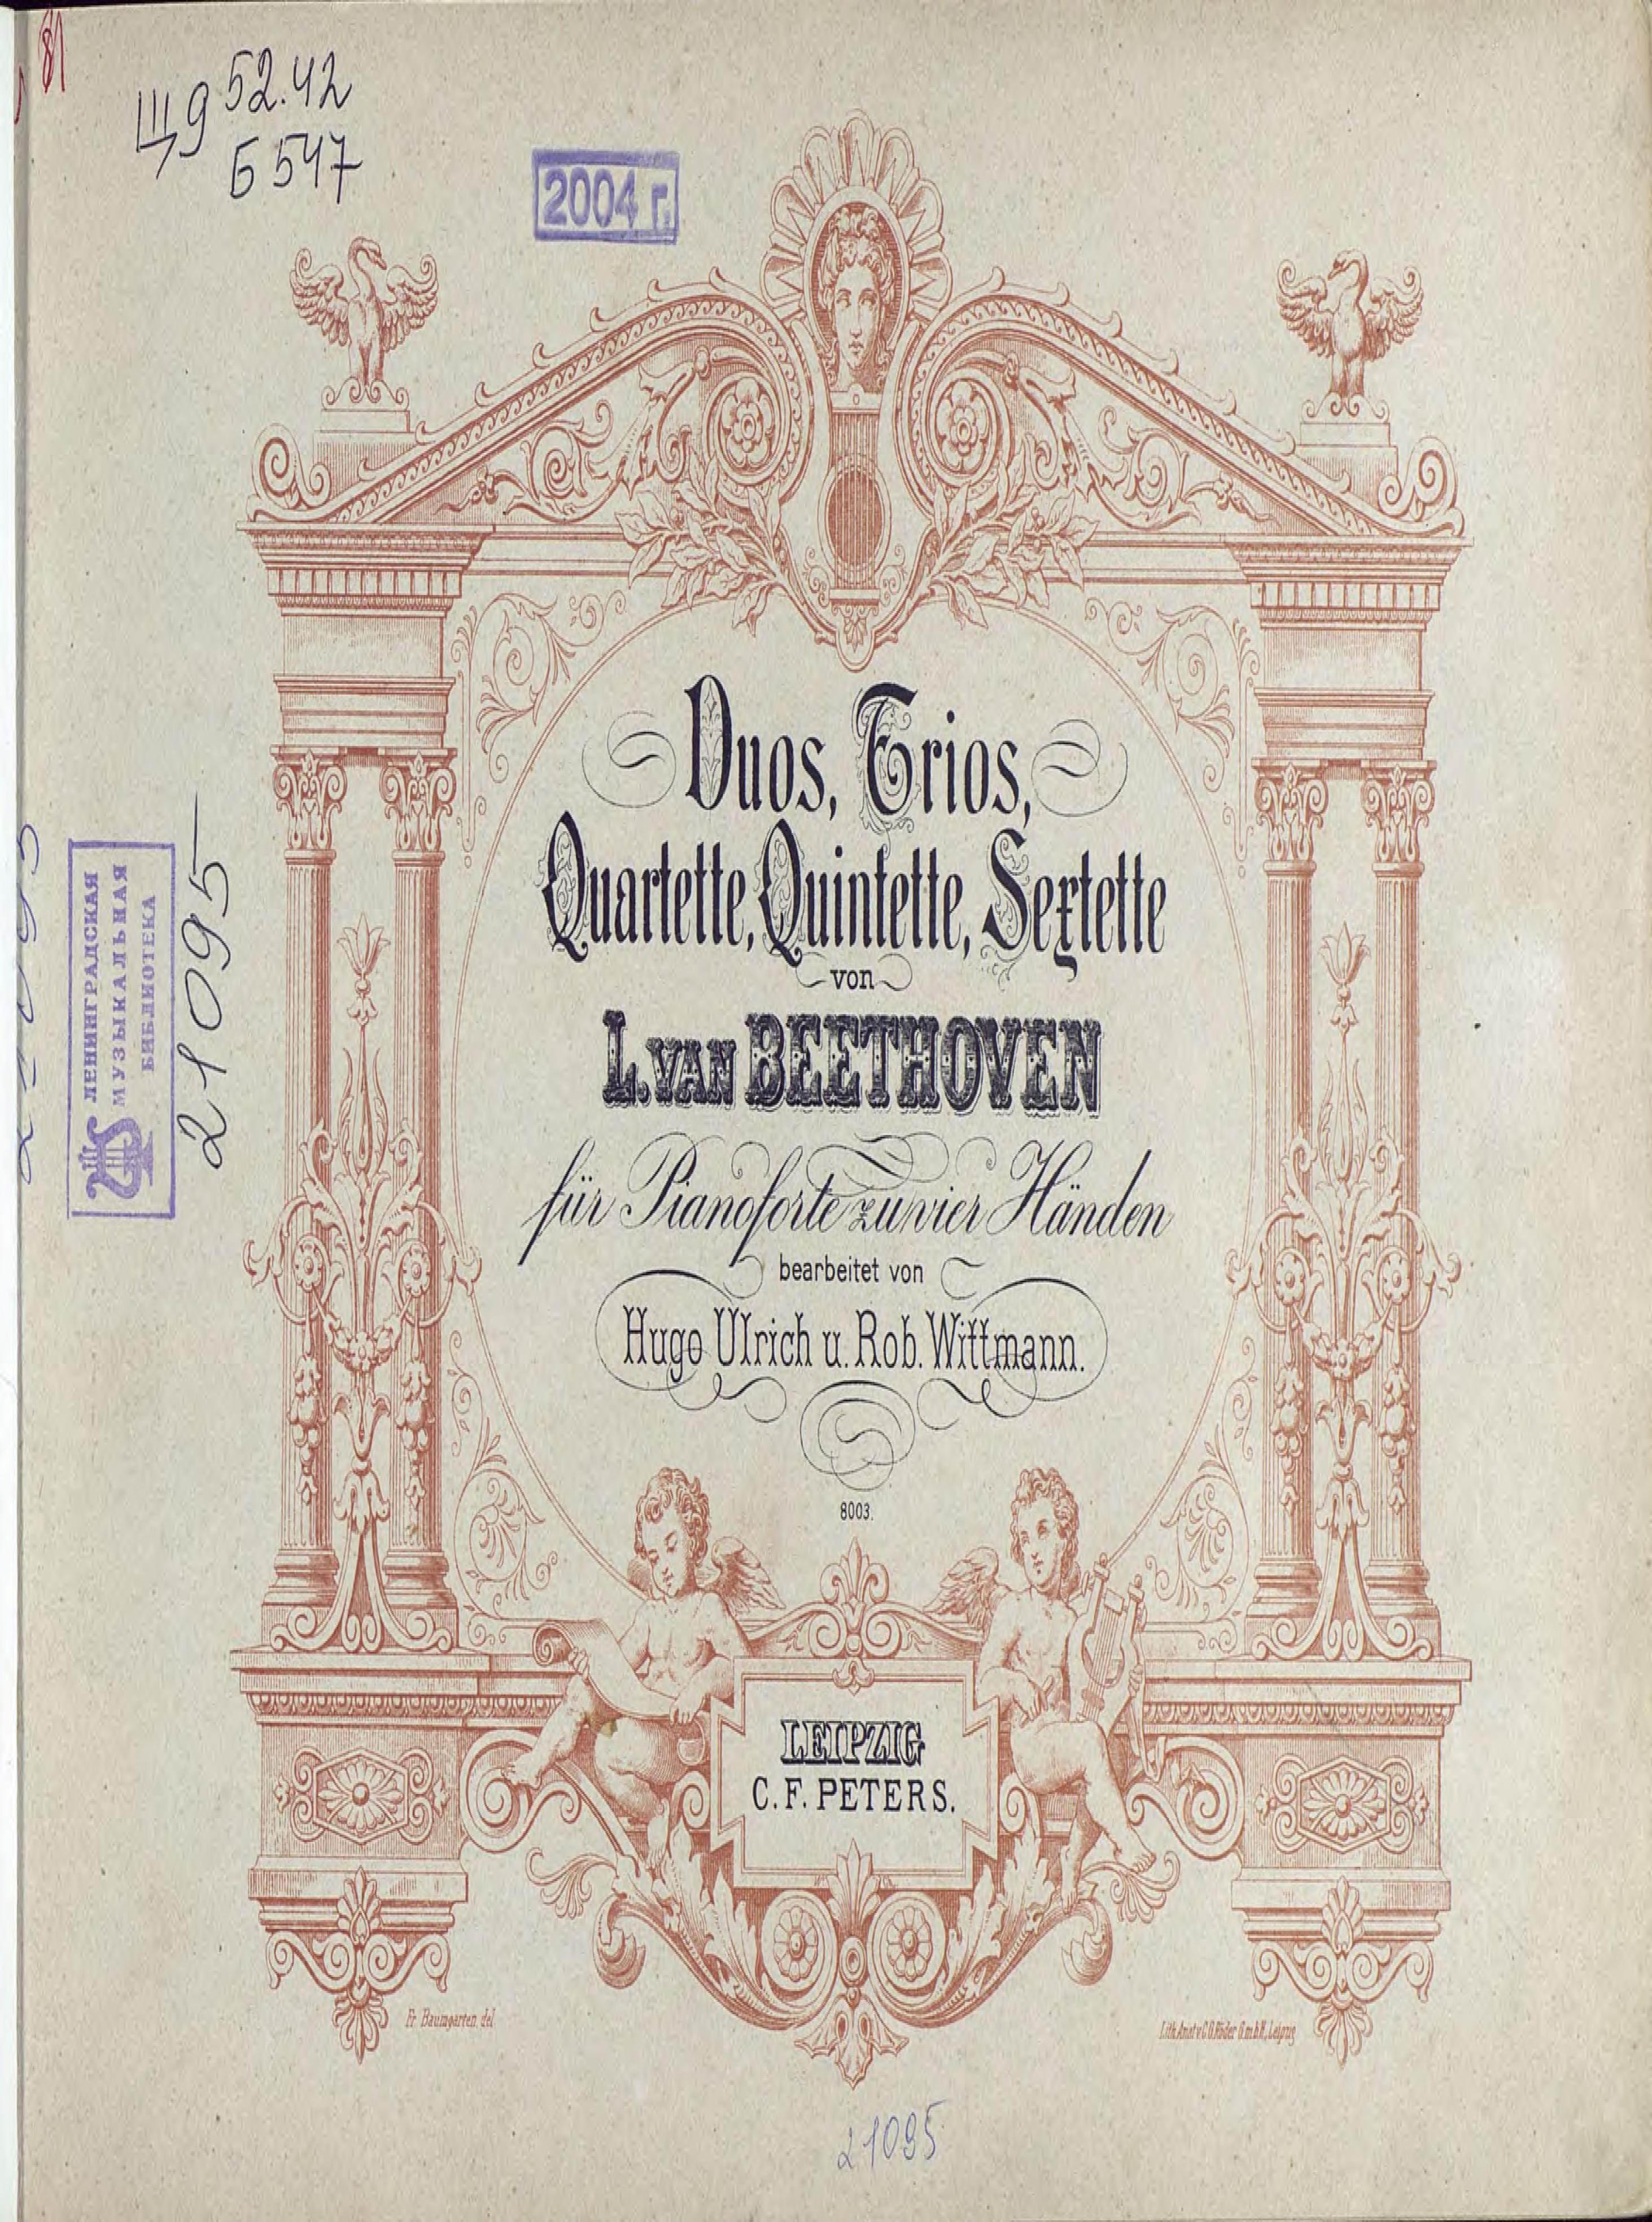 Людвиг ван Бетховен Quartette v. L. van Beethoven fur Pianoforte zu 4 Hd. людвиг ван бетховен septett v l van beethoven